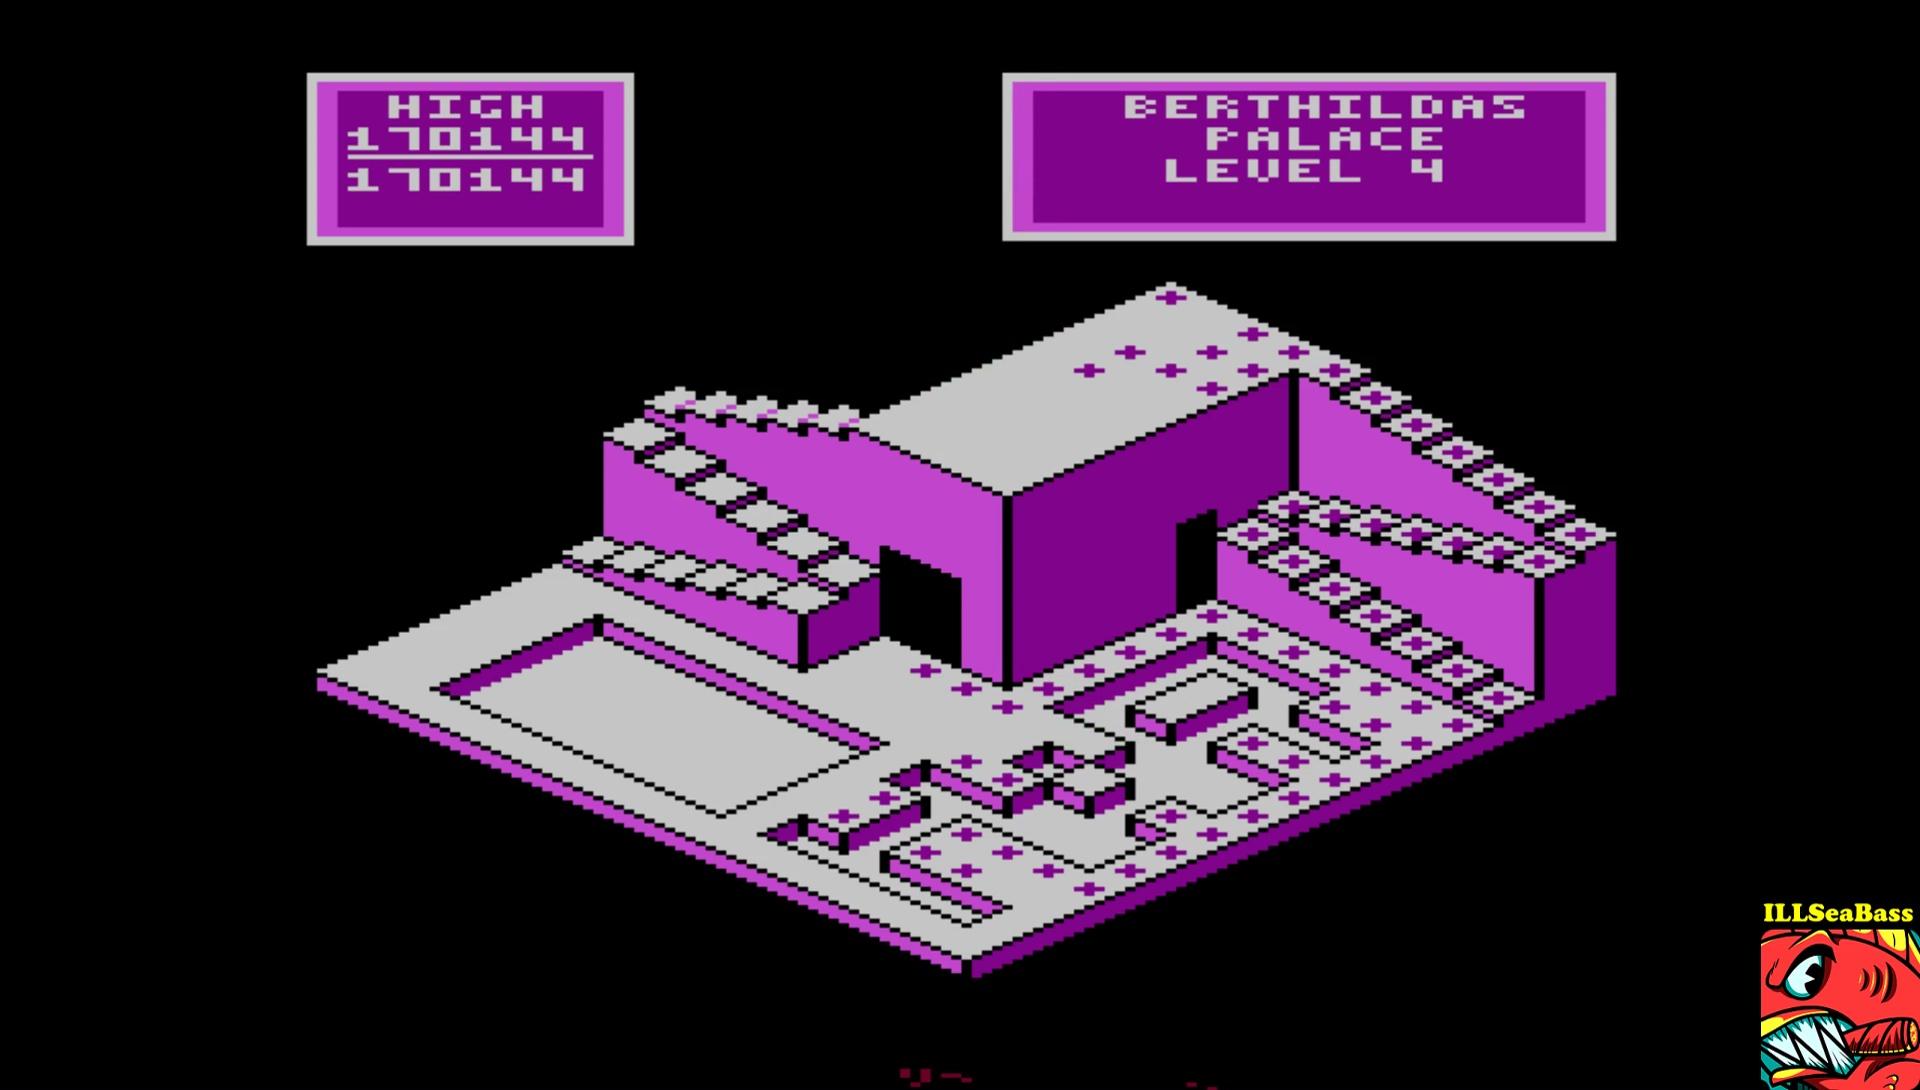 ILLSeaBass: Crystal Castles (Atari 400/800/XL/XE Emulated) 170,144 points on 2017-02-05 20:55:47